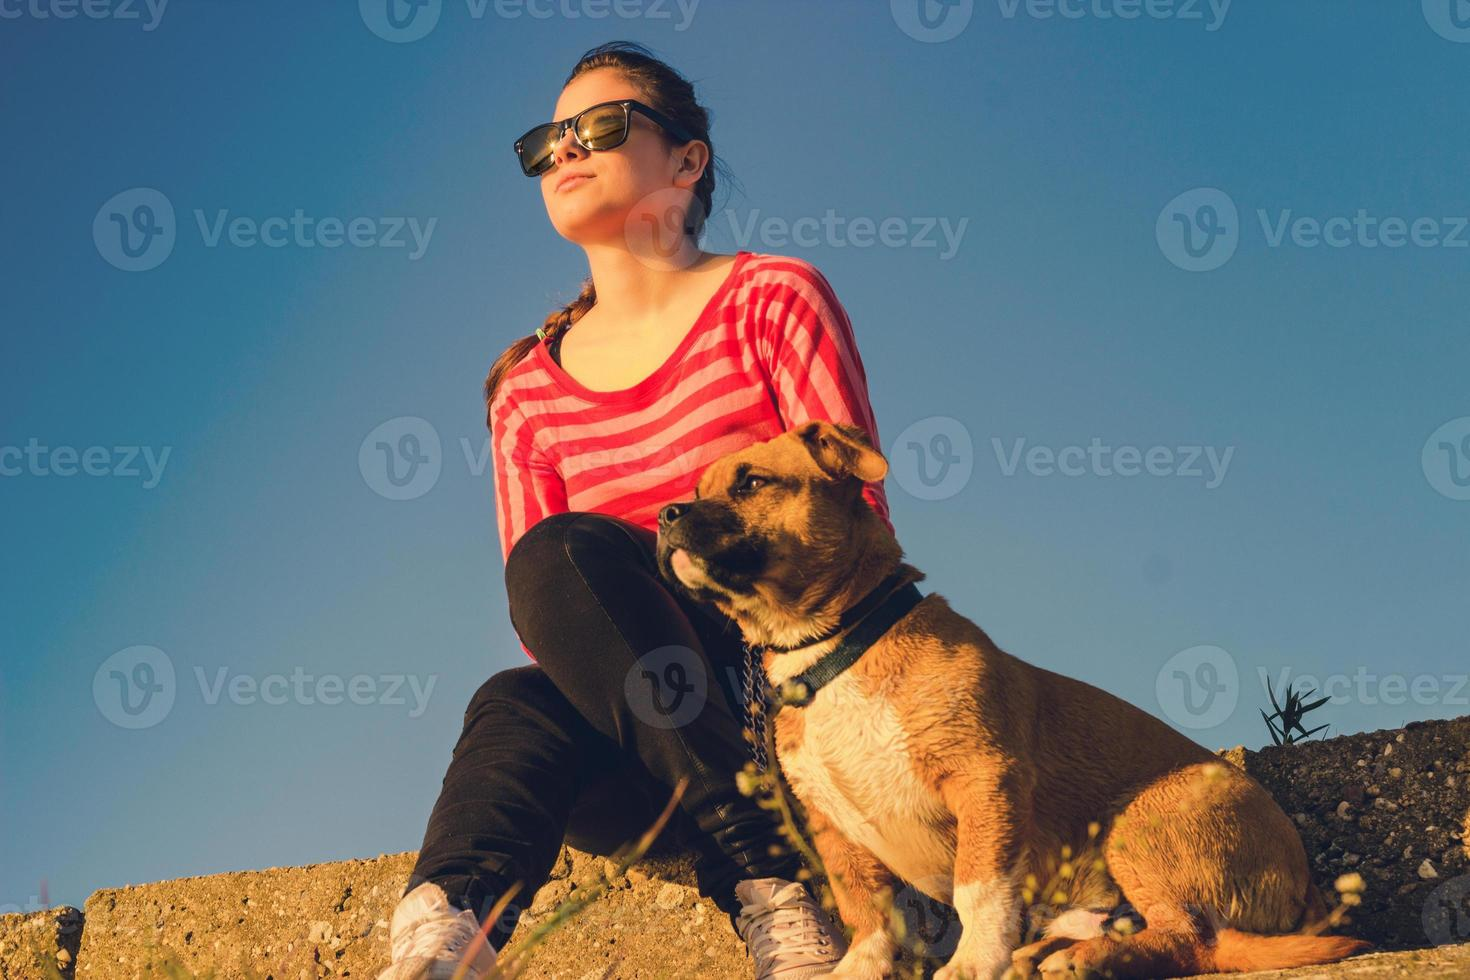 Woman with a cute dog enjoying a beautiful day outside photo